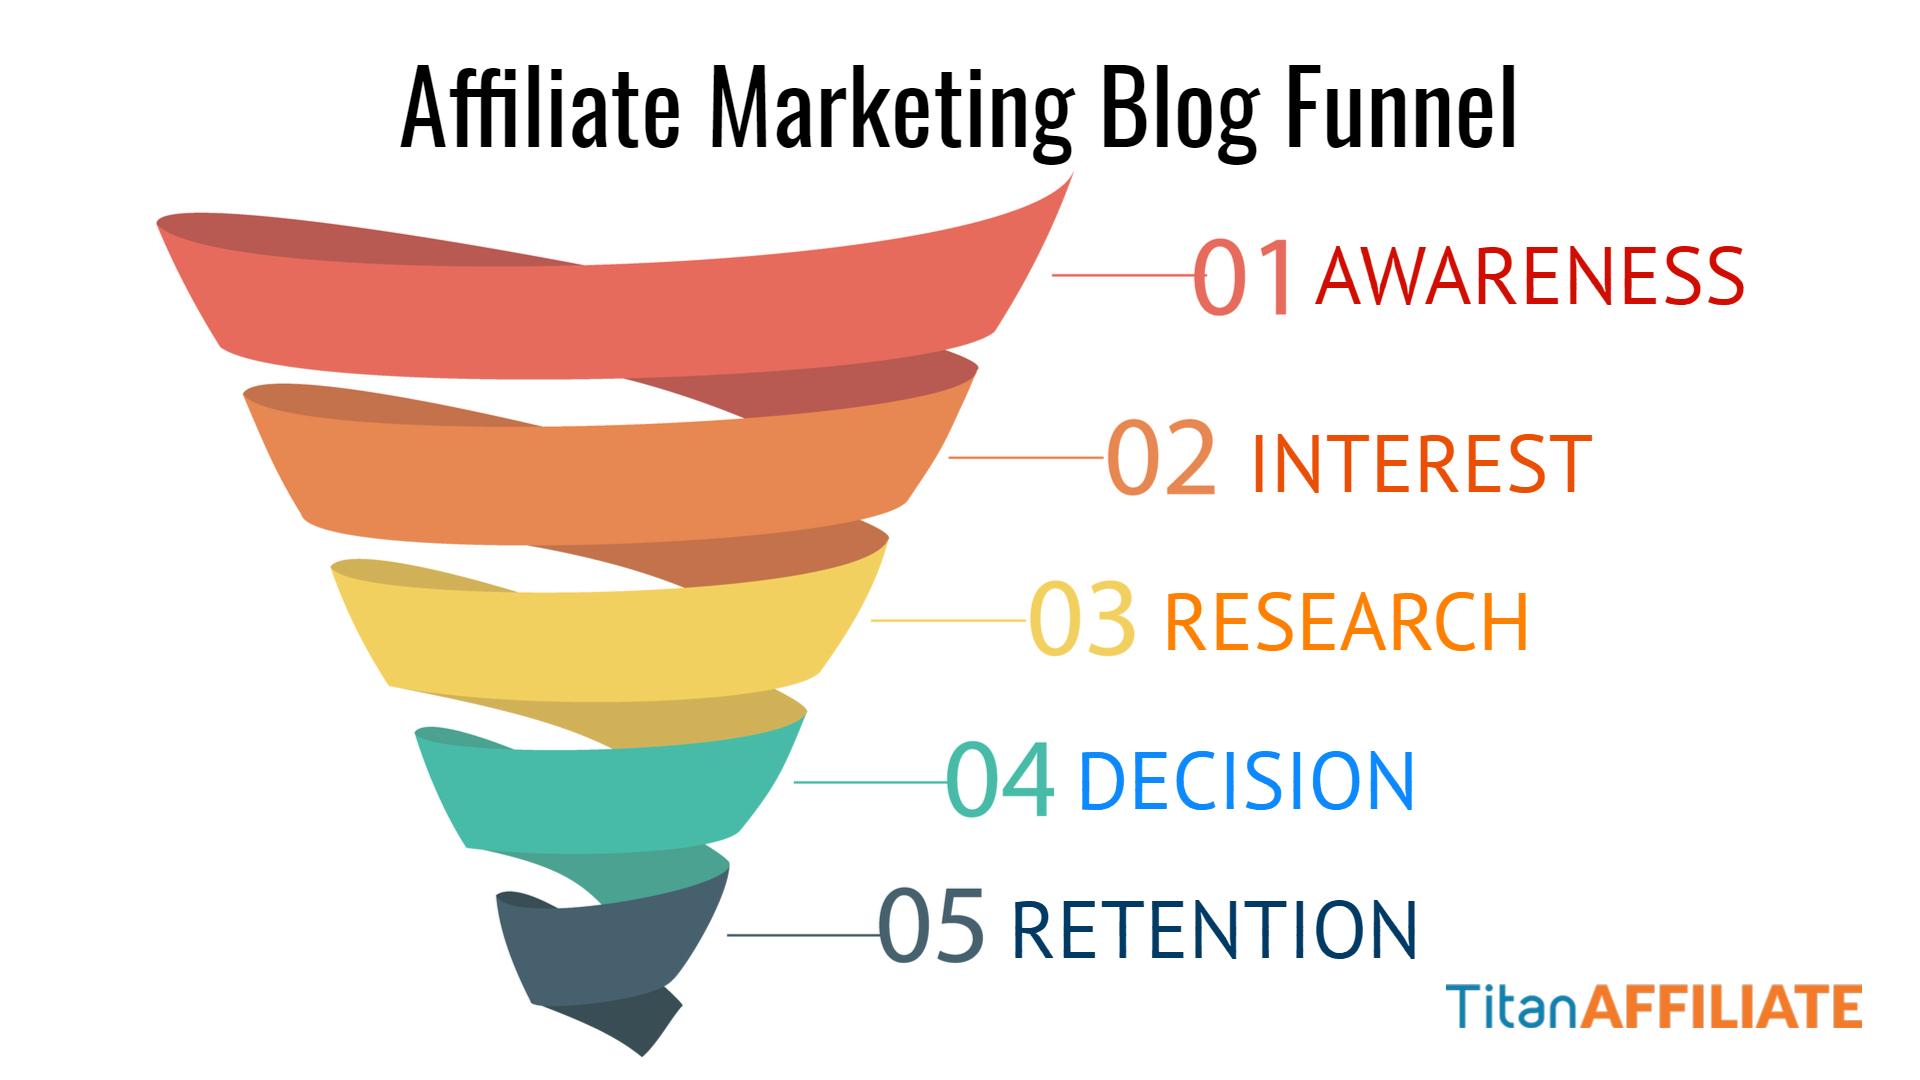 Affiliate Marketing Blog Funnel